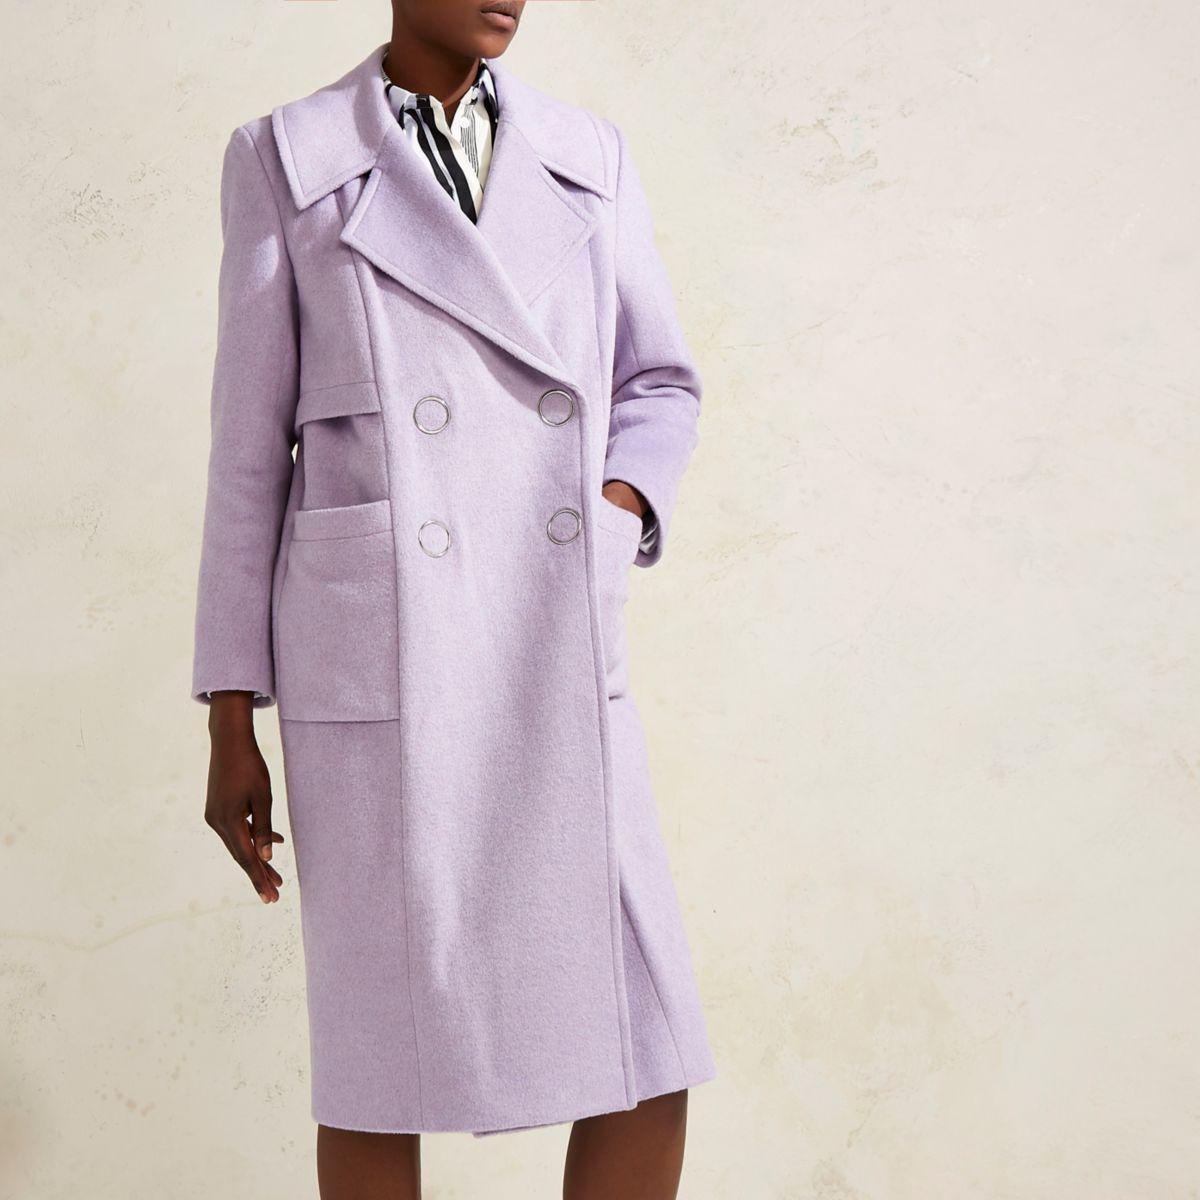 Lilac purple RI Studio oversized wool coat